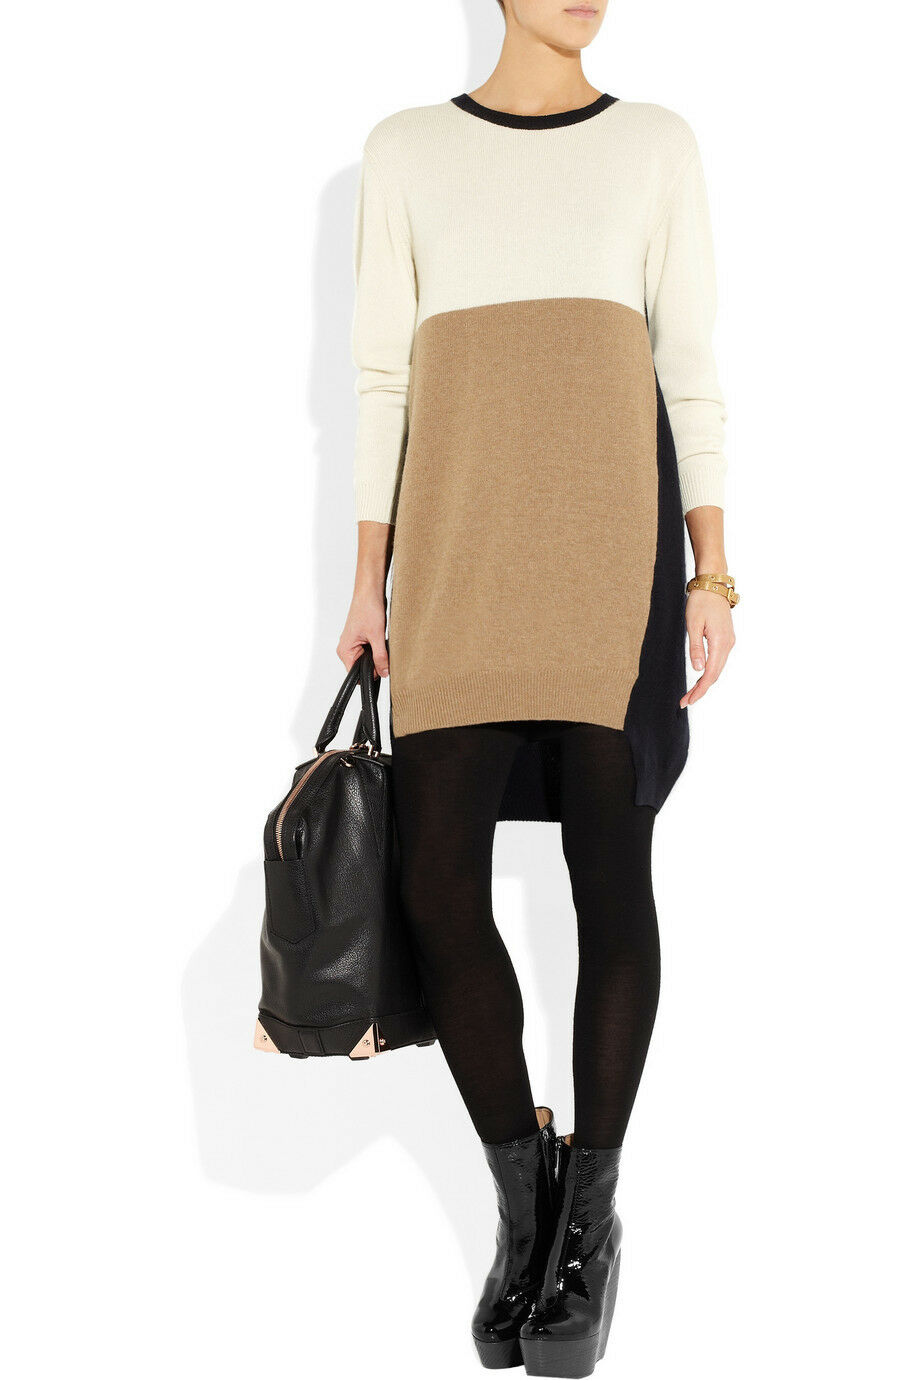 Vionnet Farbe-block wool-blend sweater dress M